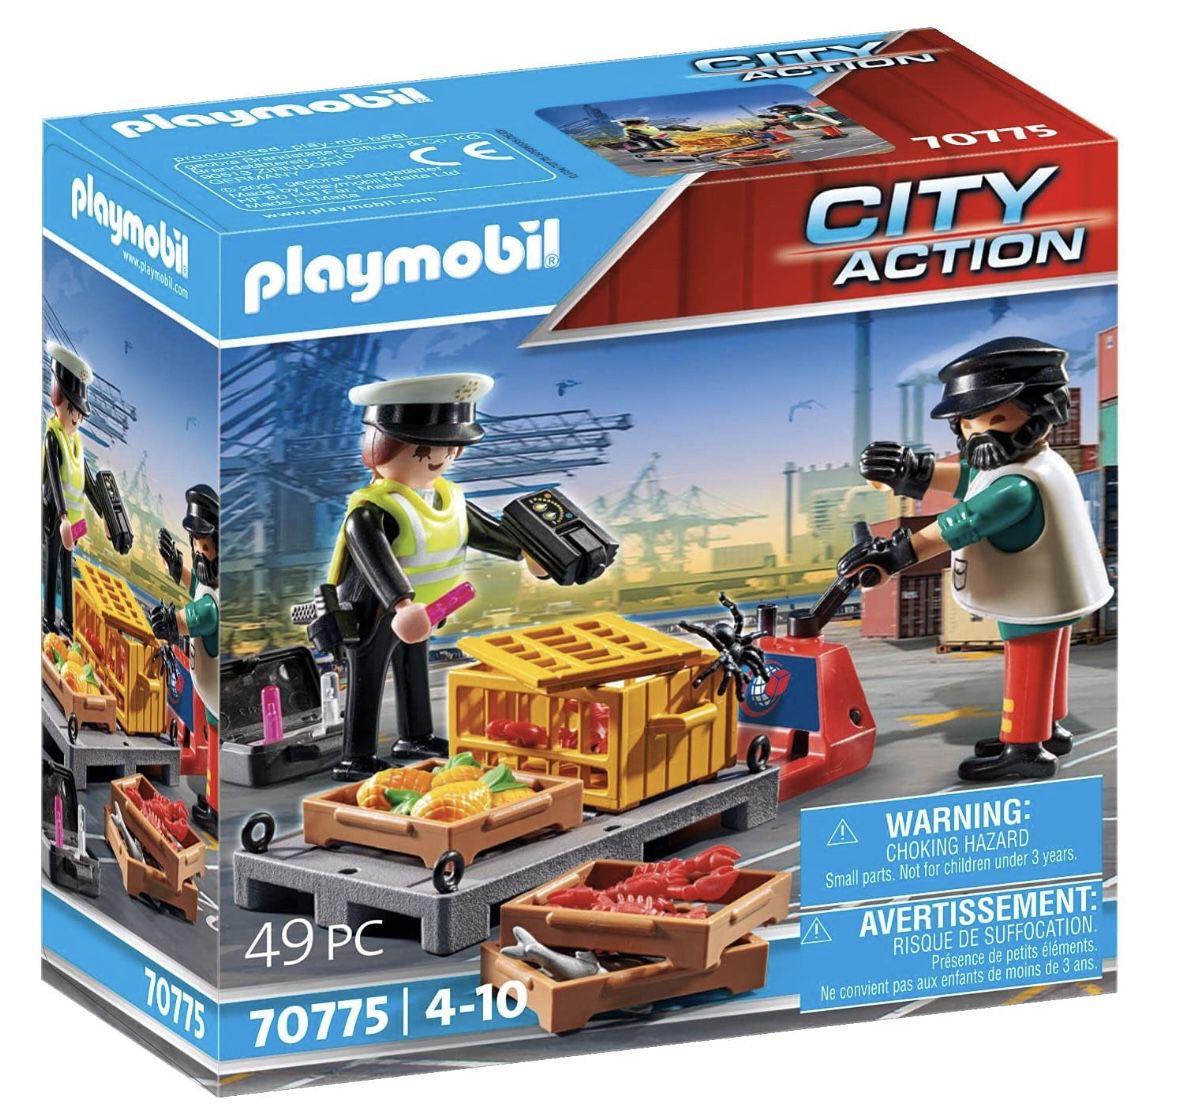 Playmobil 70775 – Zollkontrolle für 7,99€ (statt 10€)